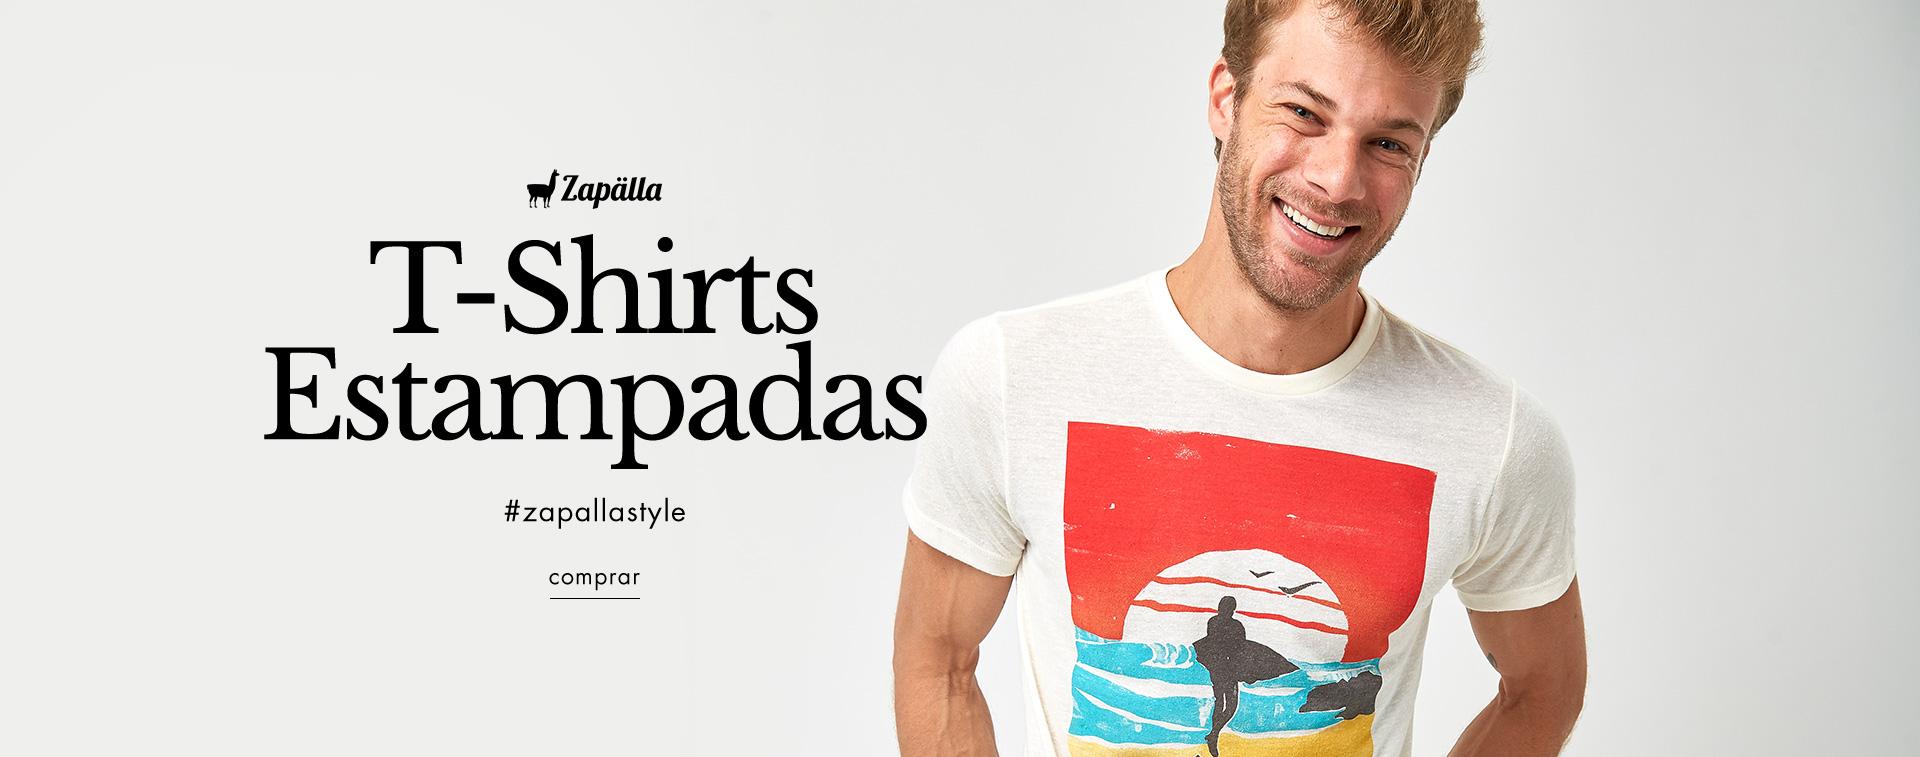 Zapalla Printed T-Shirts